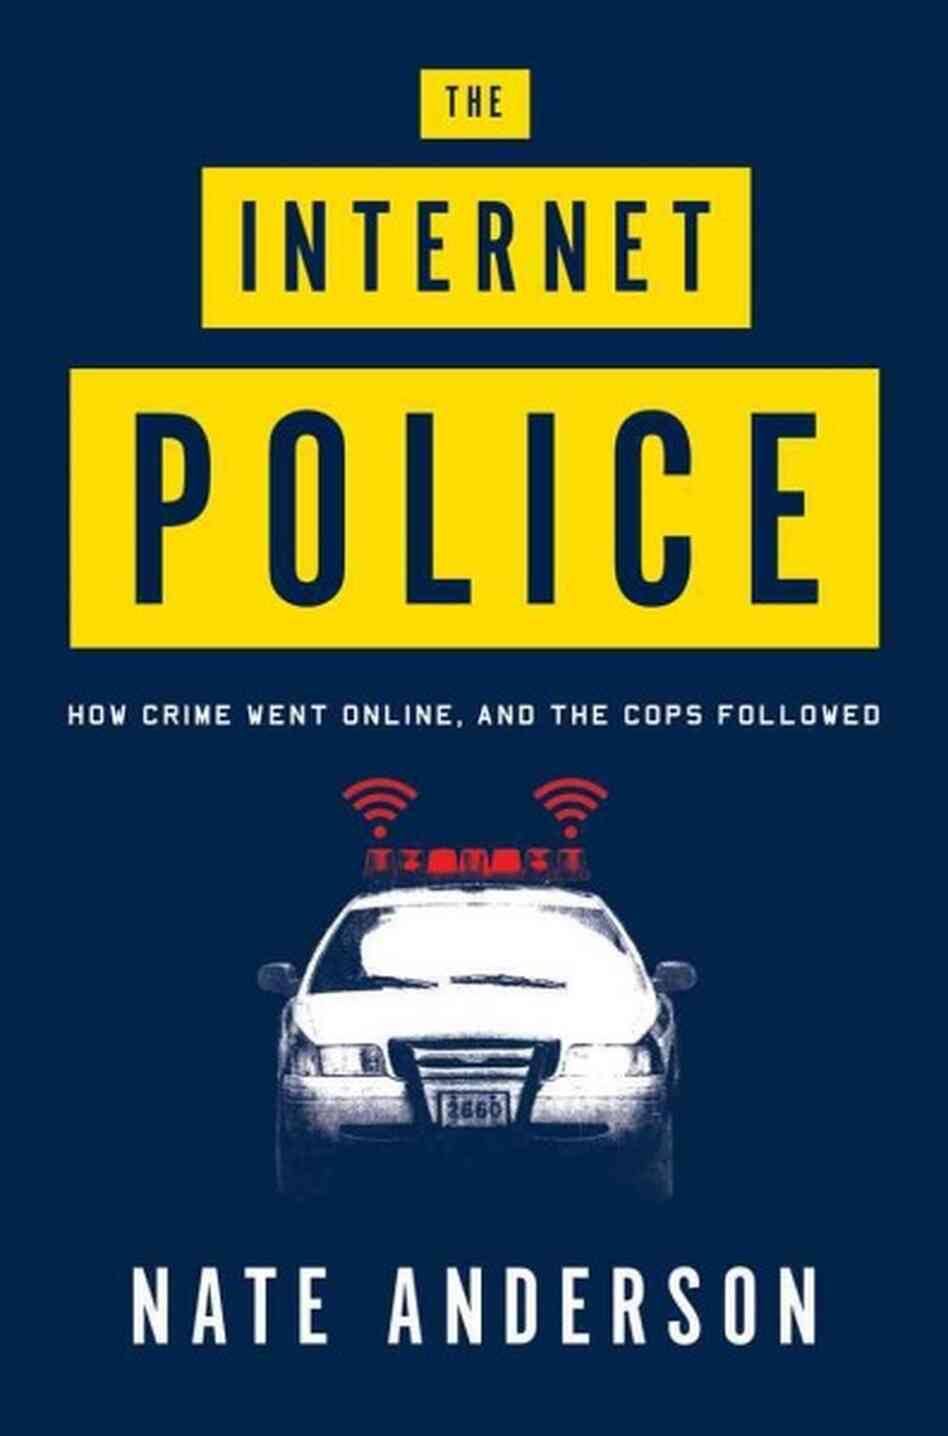 https://i0.wp.com/media.npr.org/assets/bakertaylor/covers/t/the-internet-police/9780393062984_custom-6e78a1f634f9b2c3b81272890e0d5fcd031b80ad-s6-c30.jpg